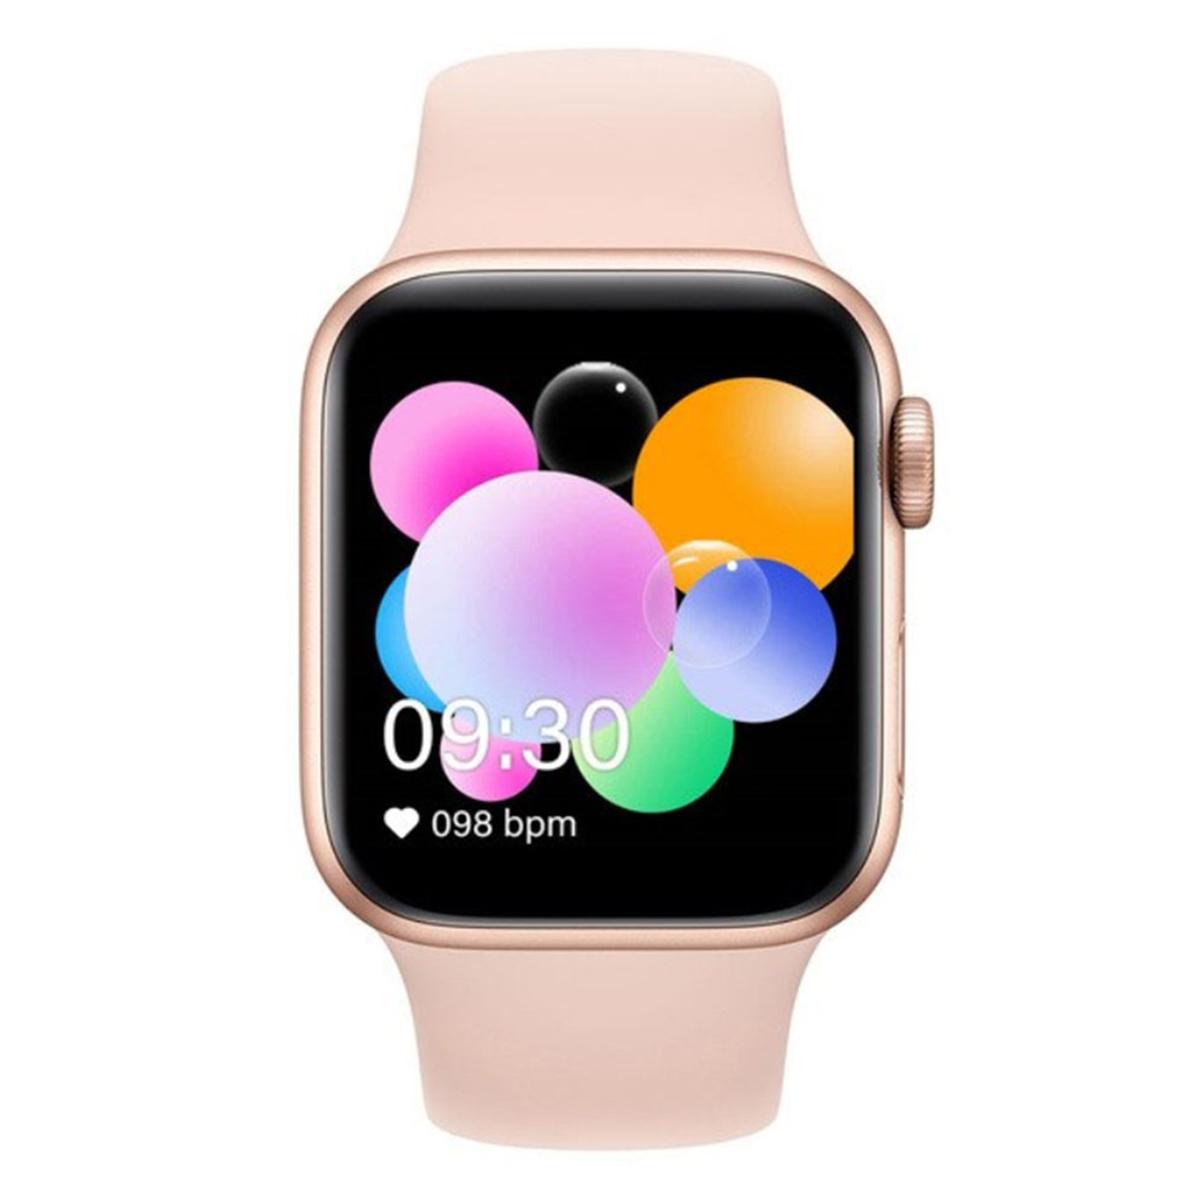 Relógio Smartwatch Inteligente - IWO T900 - 44mm